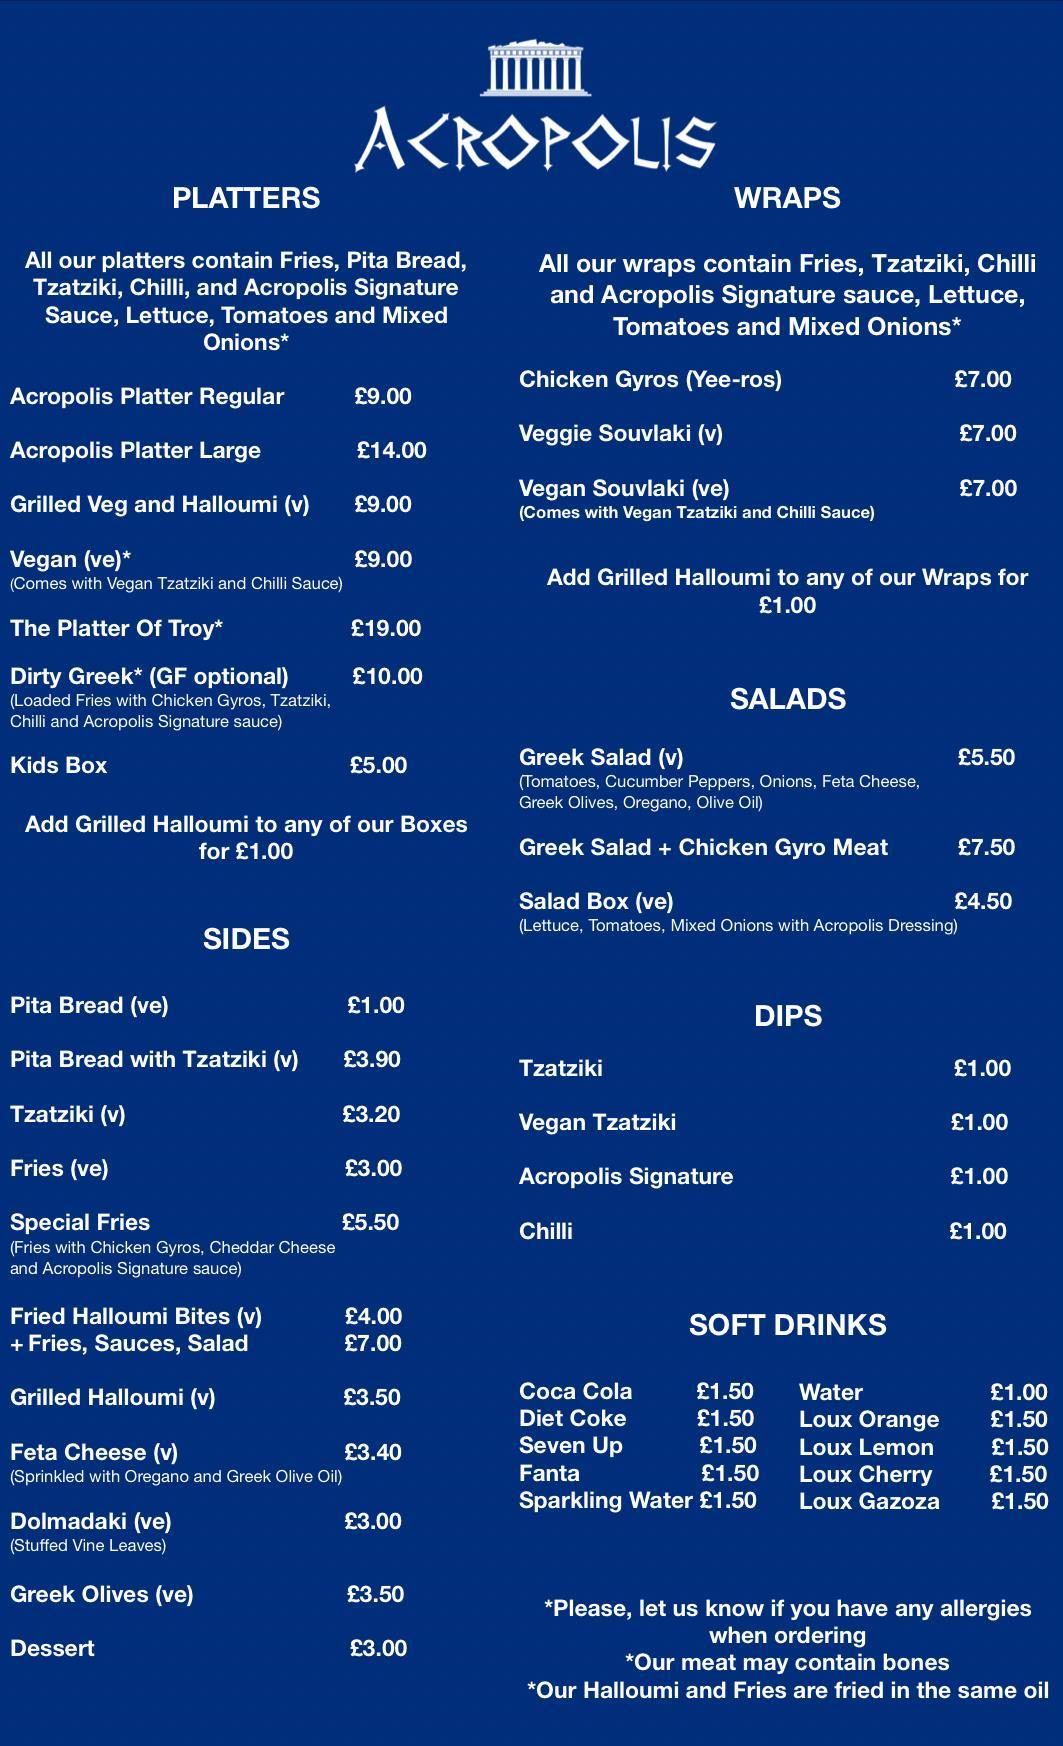 Acropolis menu